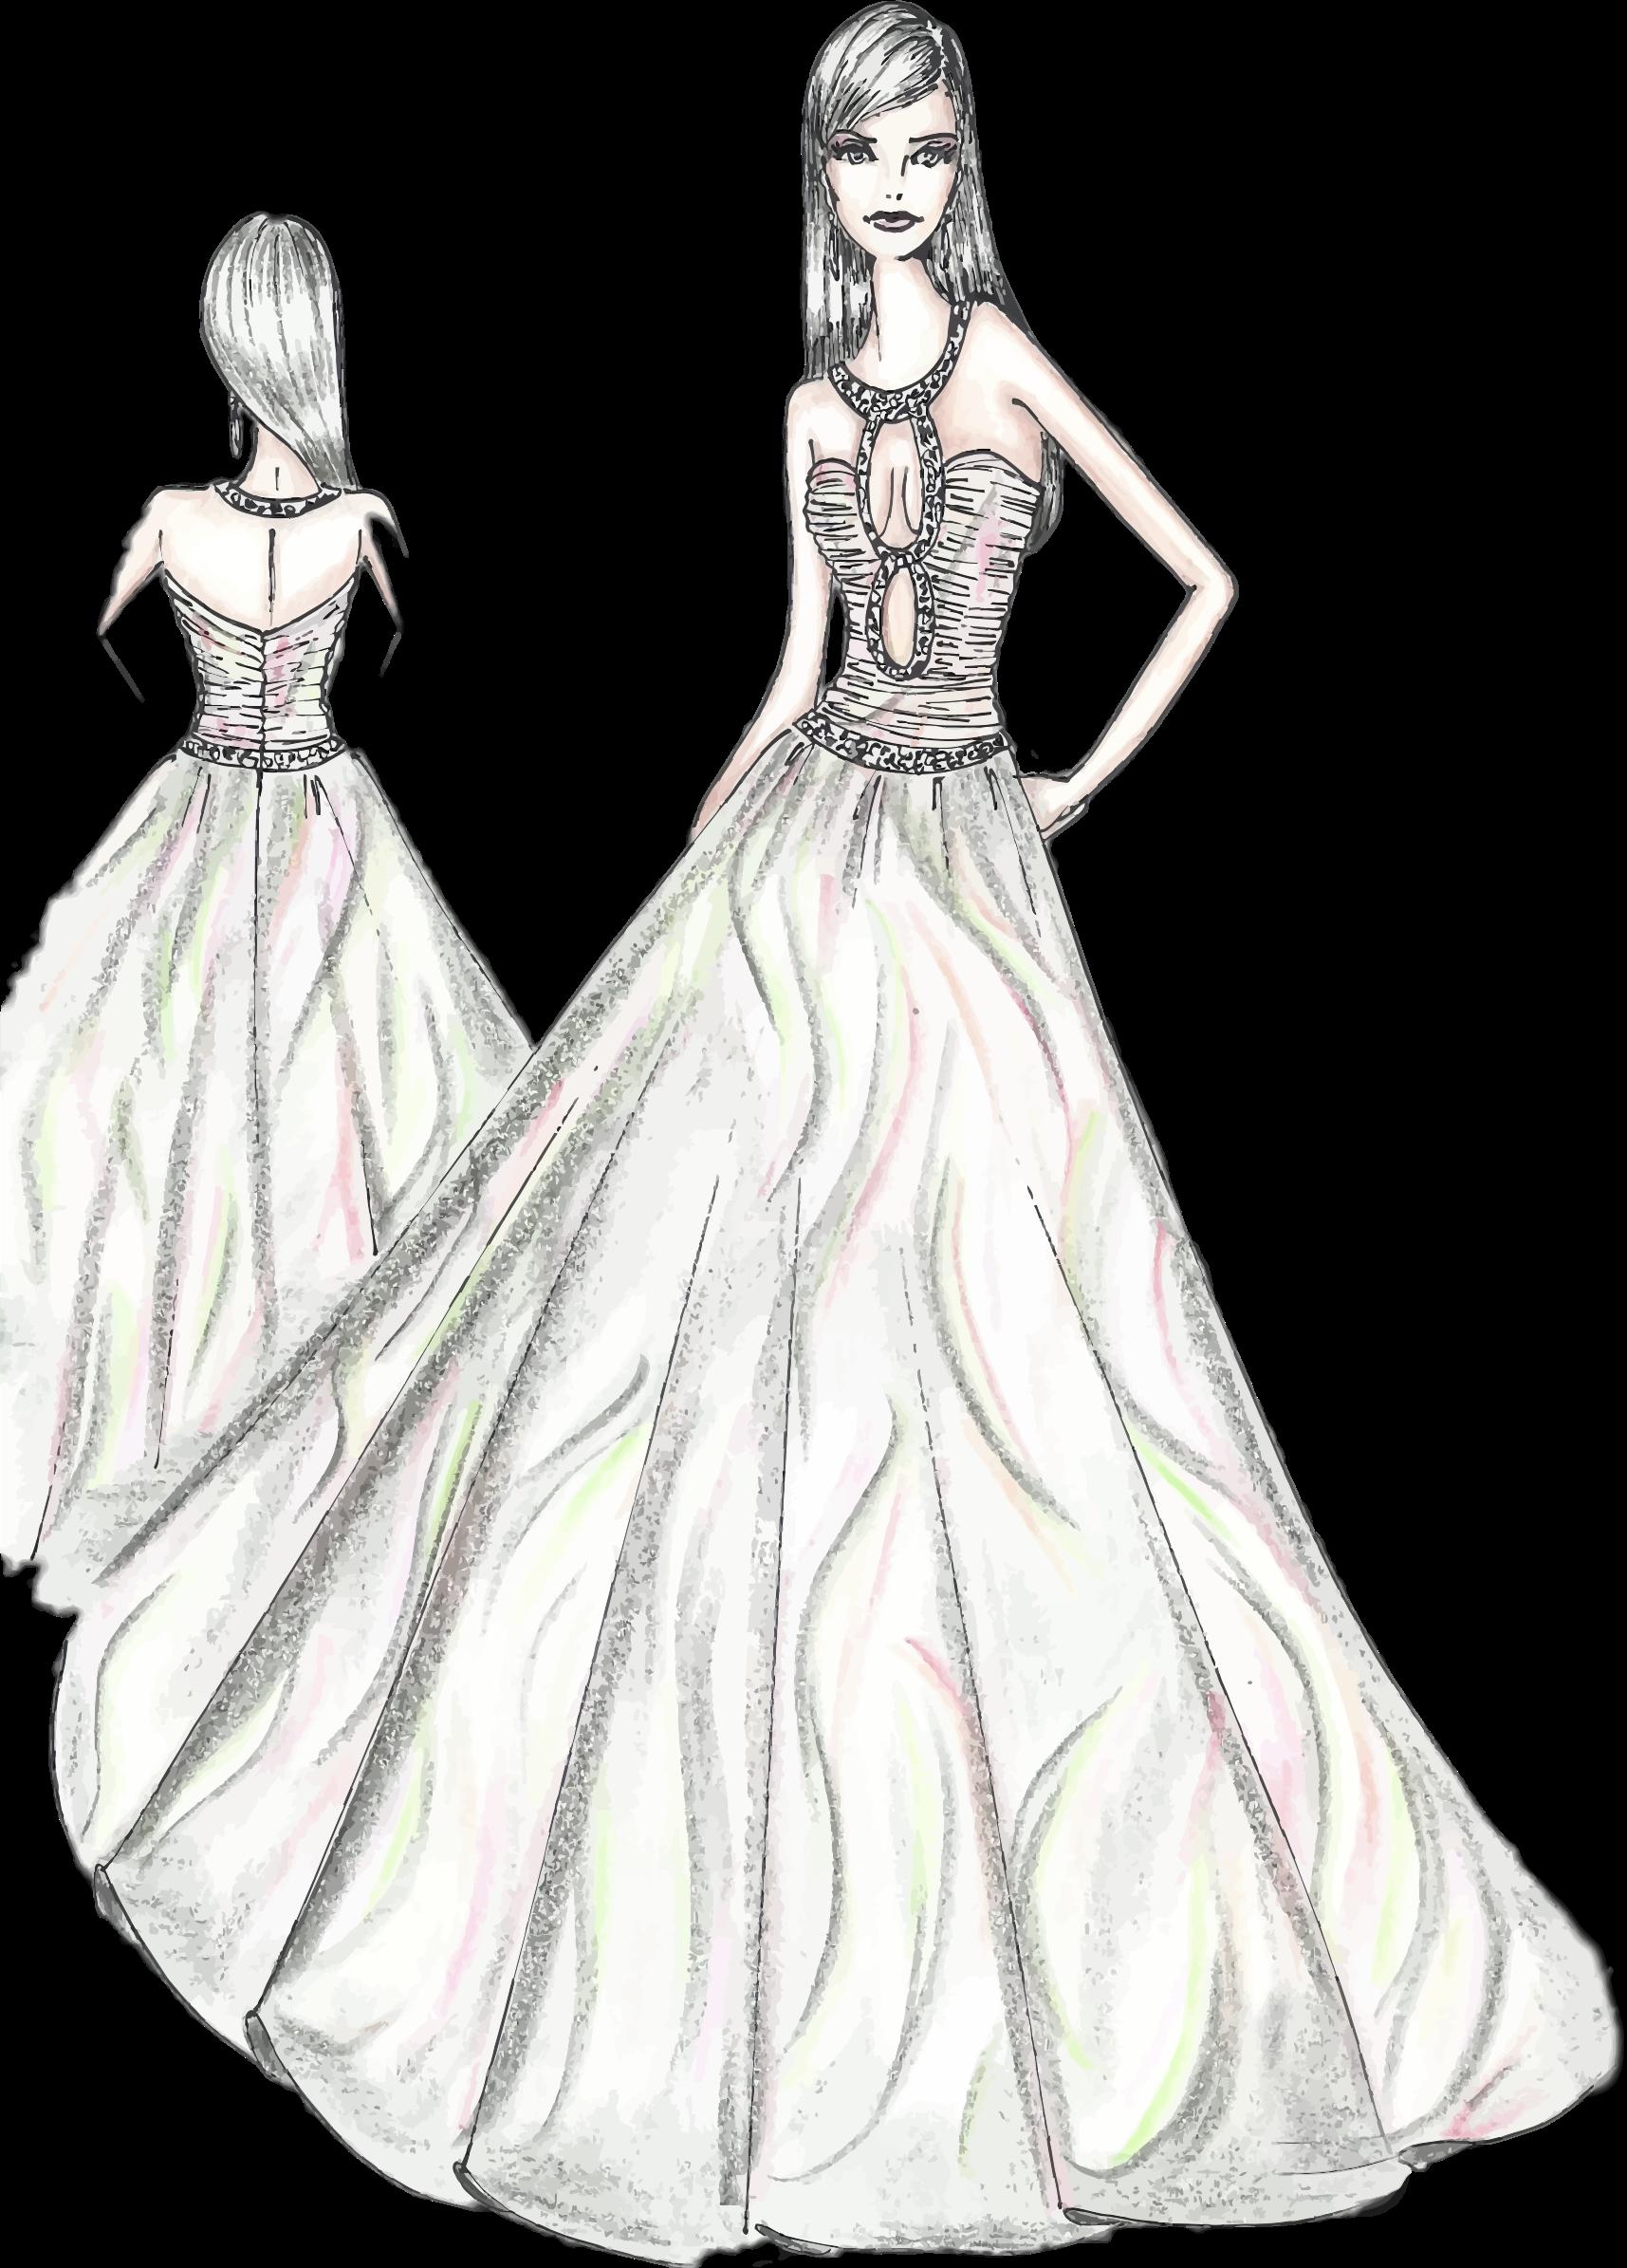 Woman sketch big image. Fashion clipart dress